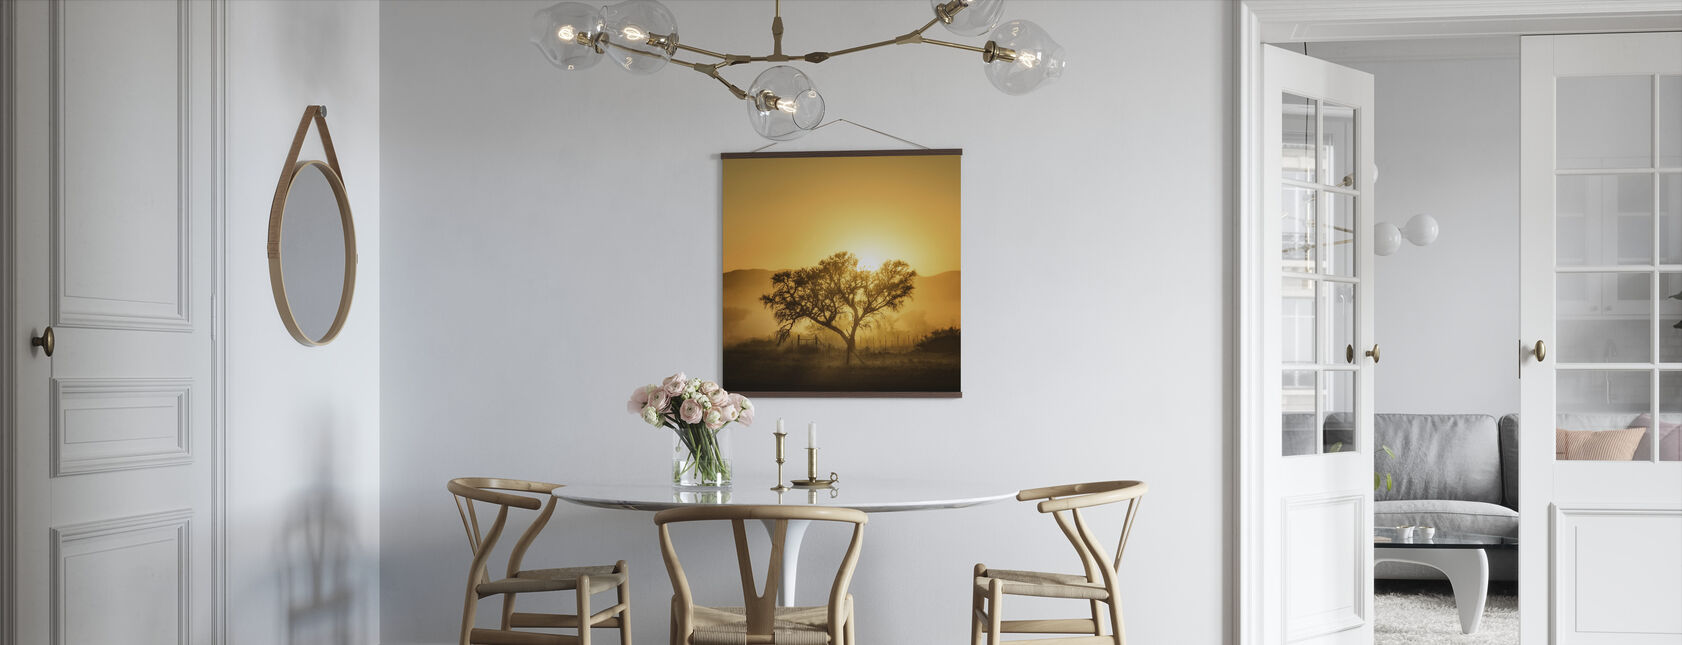 Golden Sunrise - Poster - Kitchen